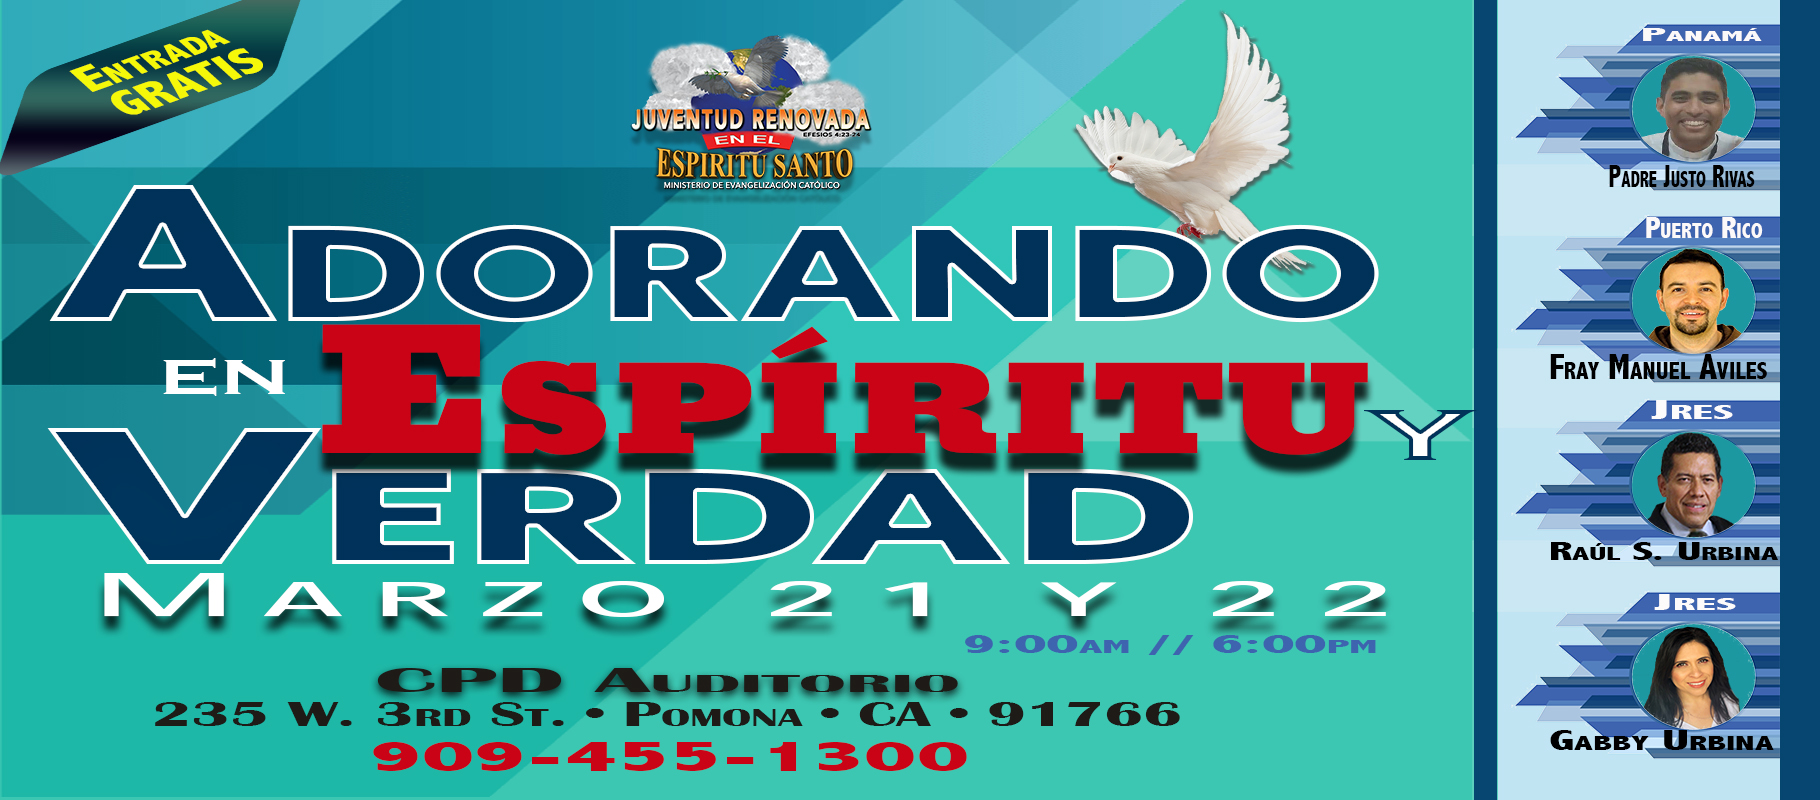 ARDIENDO web banner